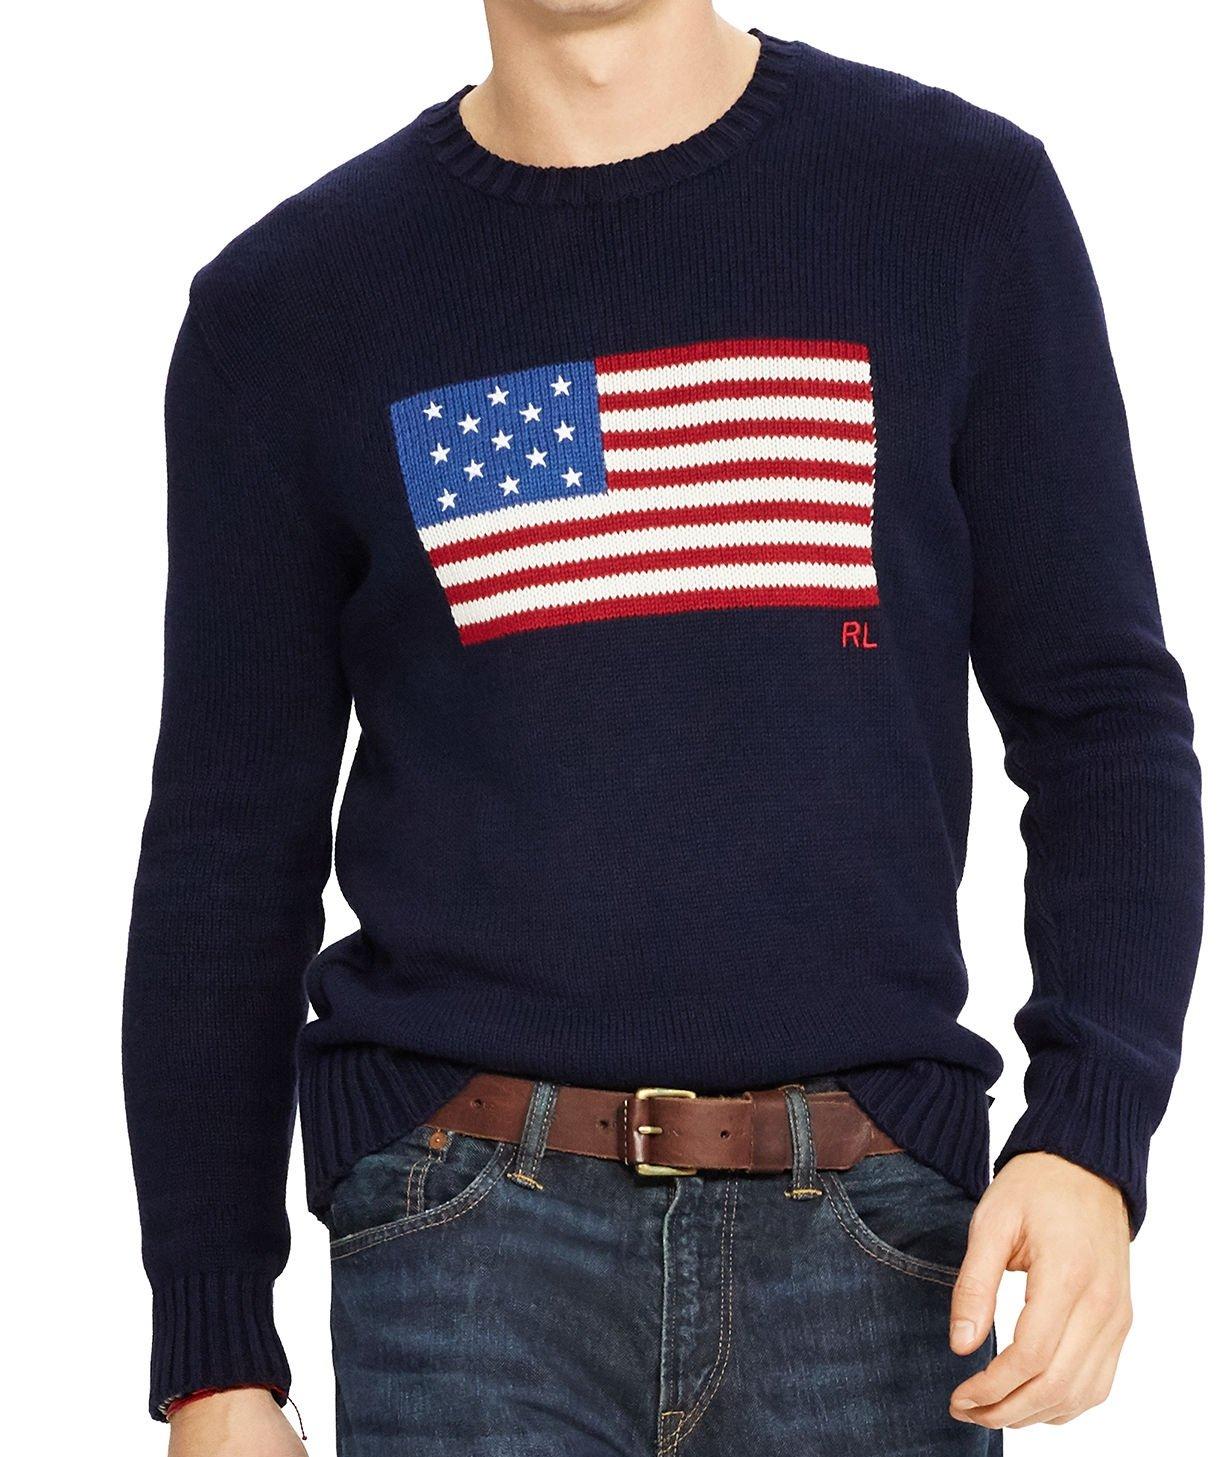 Polo Ralph Lauren Men's Flag Cotton Crew Neck Sweater USA Flag RL Embroidered Navy USA Flag Size XX-Large